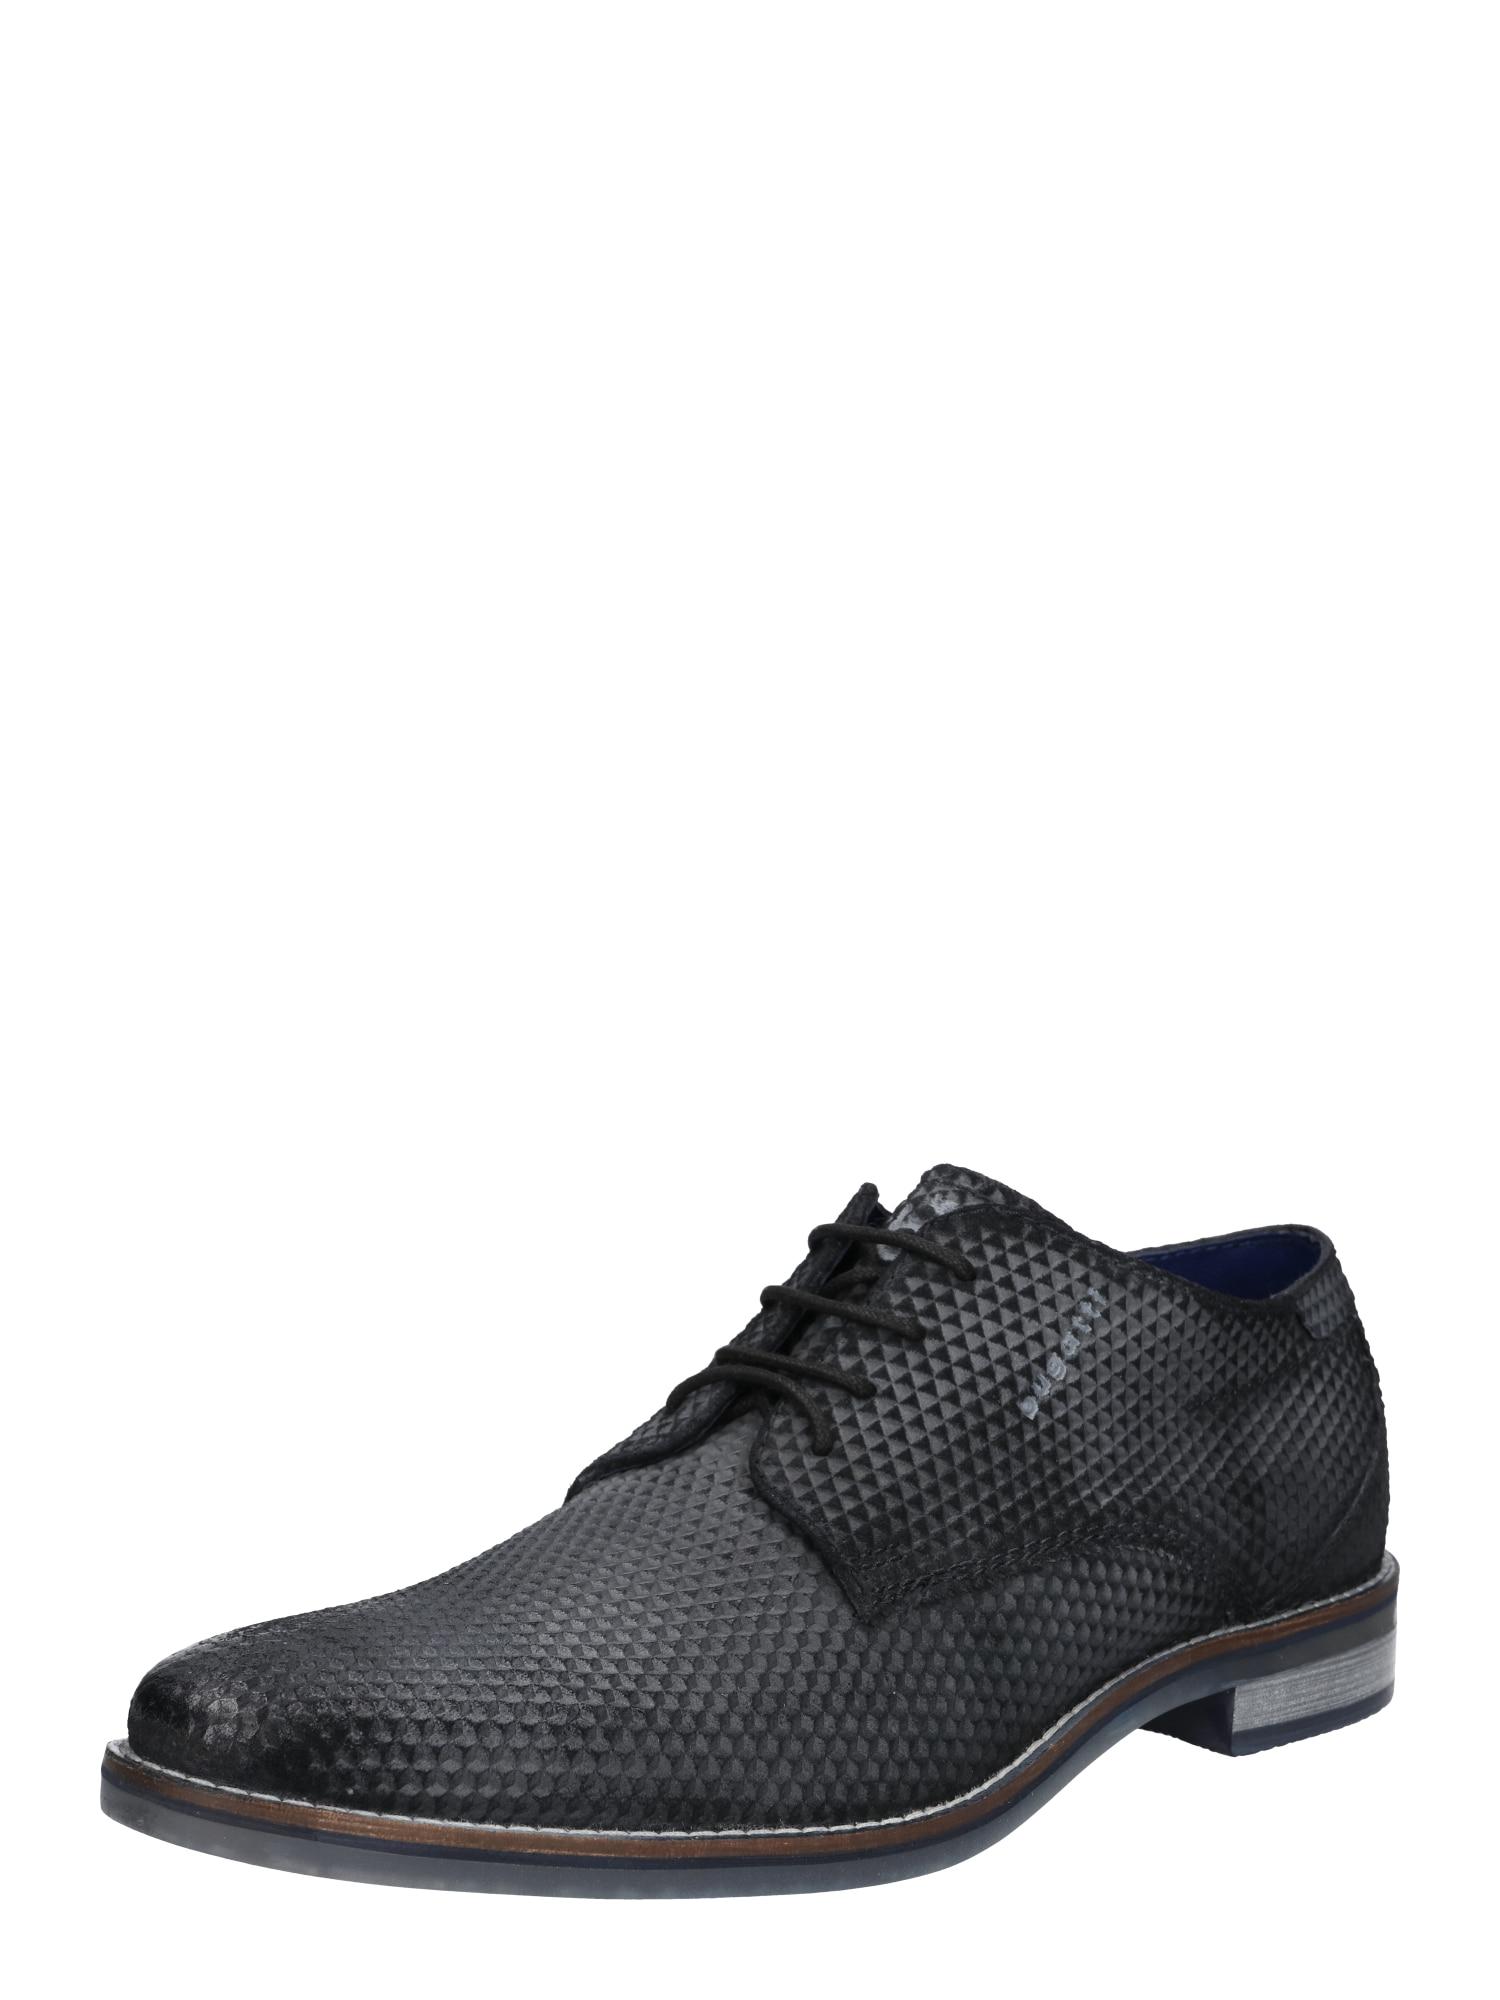 Šněrovací boty Gagno šedá černá Bugatti